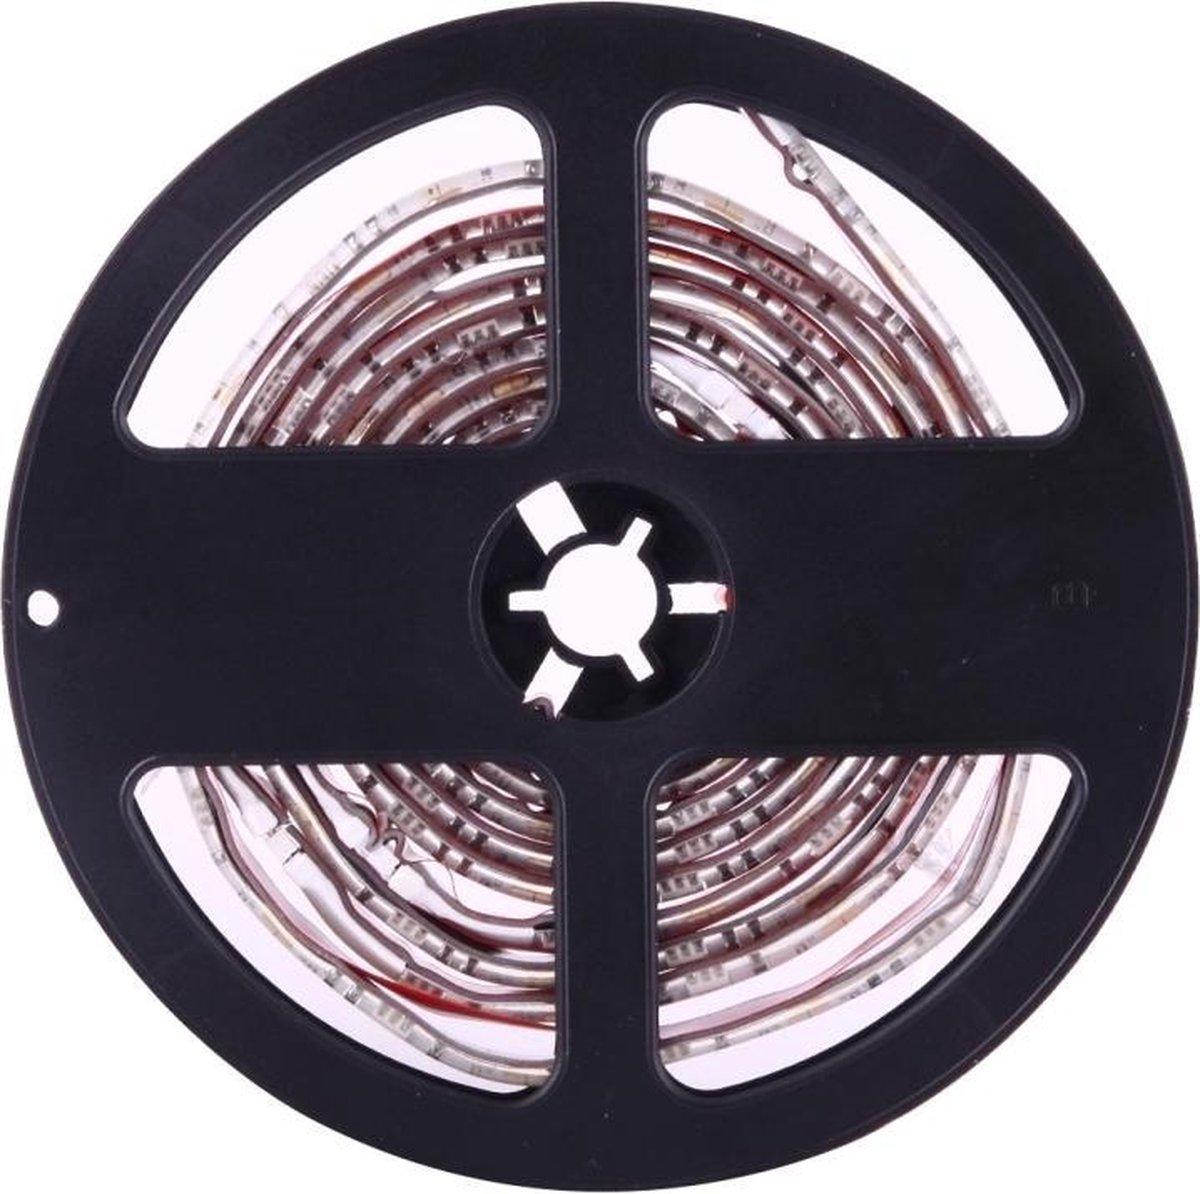 4 x 50 cm USB-tv Epoxy Rope Light, Breed: 10 mm, 3 W IP65 Waterdicht 30 LED's SMD 5050 met 44-toetsen afstandsbediening (kleurrijk licht)